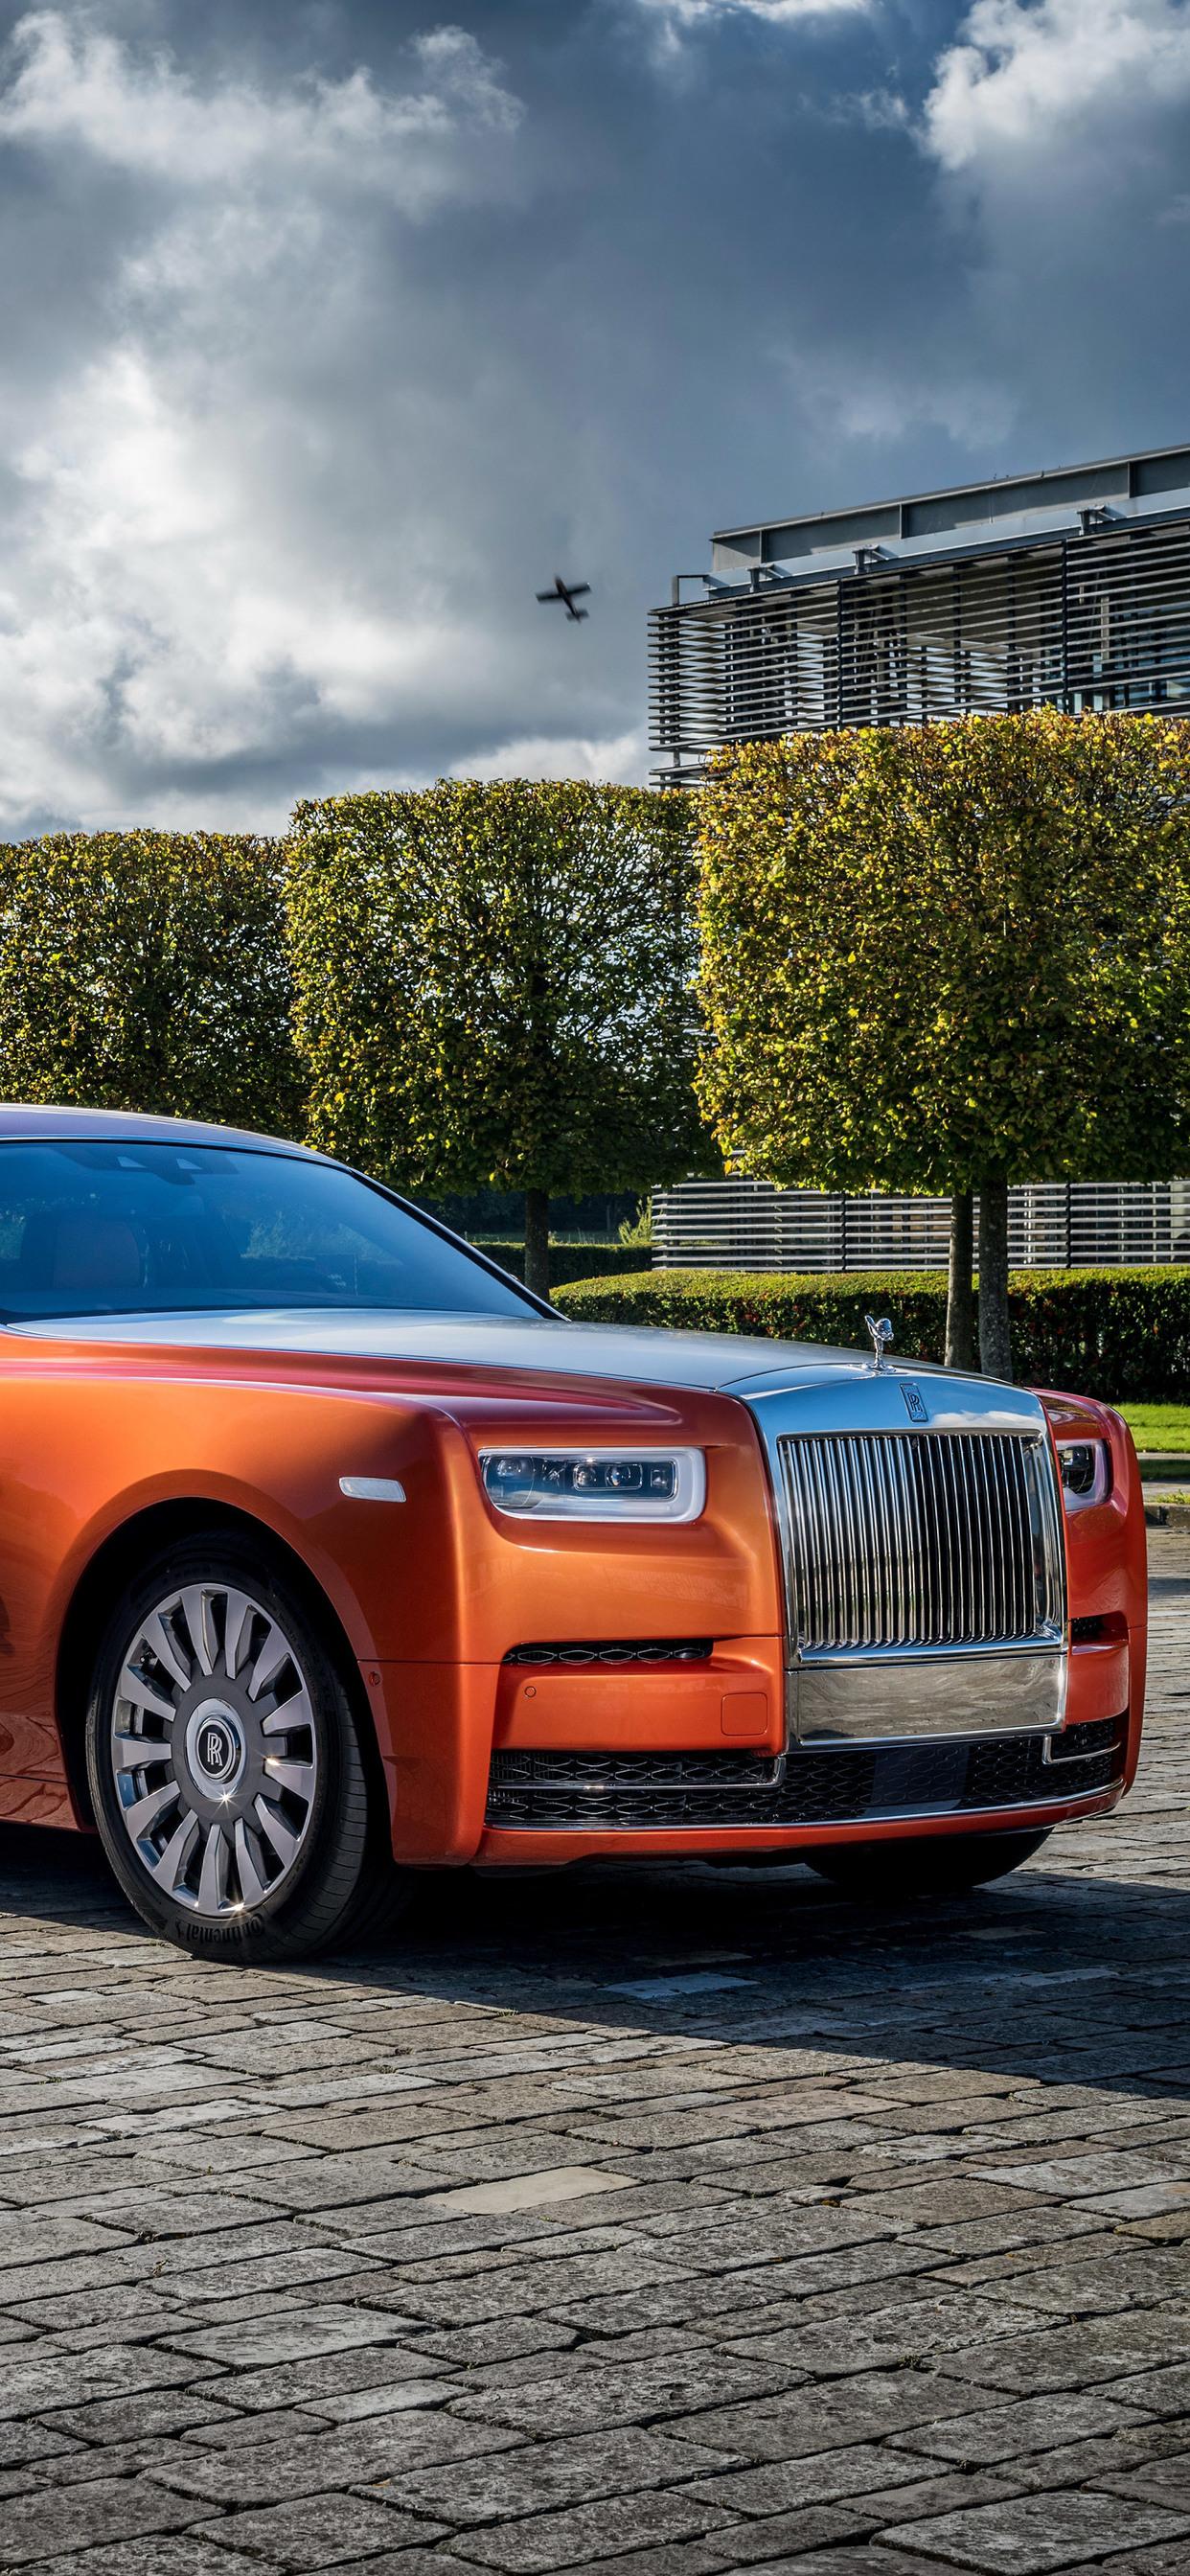 Rolls Royce Car Iphone Wallpapers Wallpaper Cave